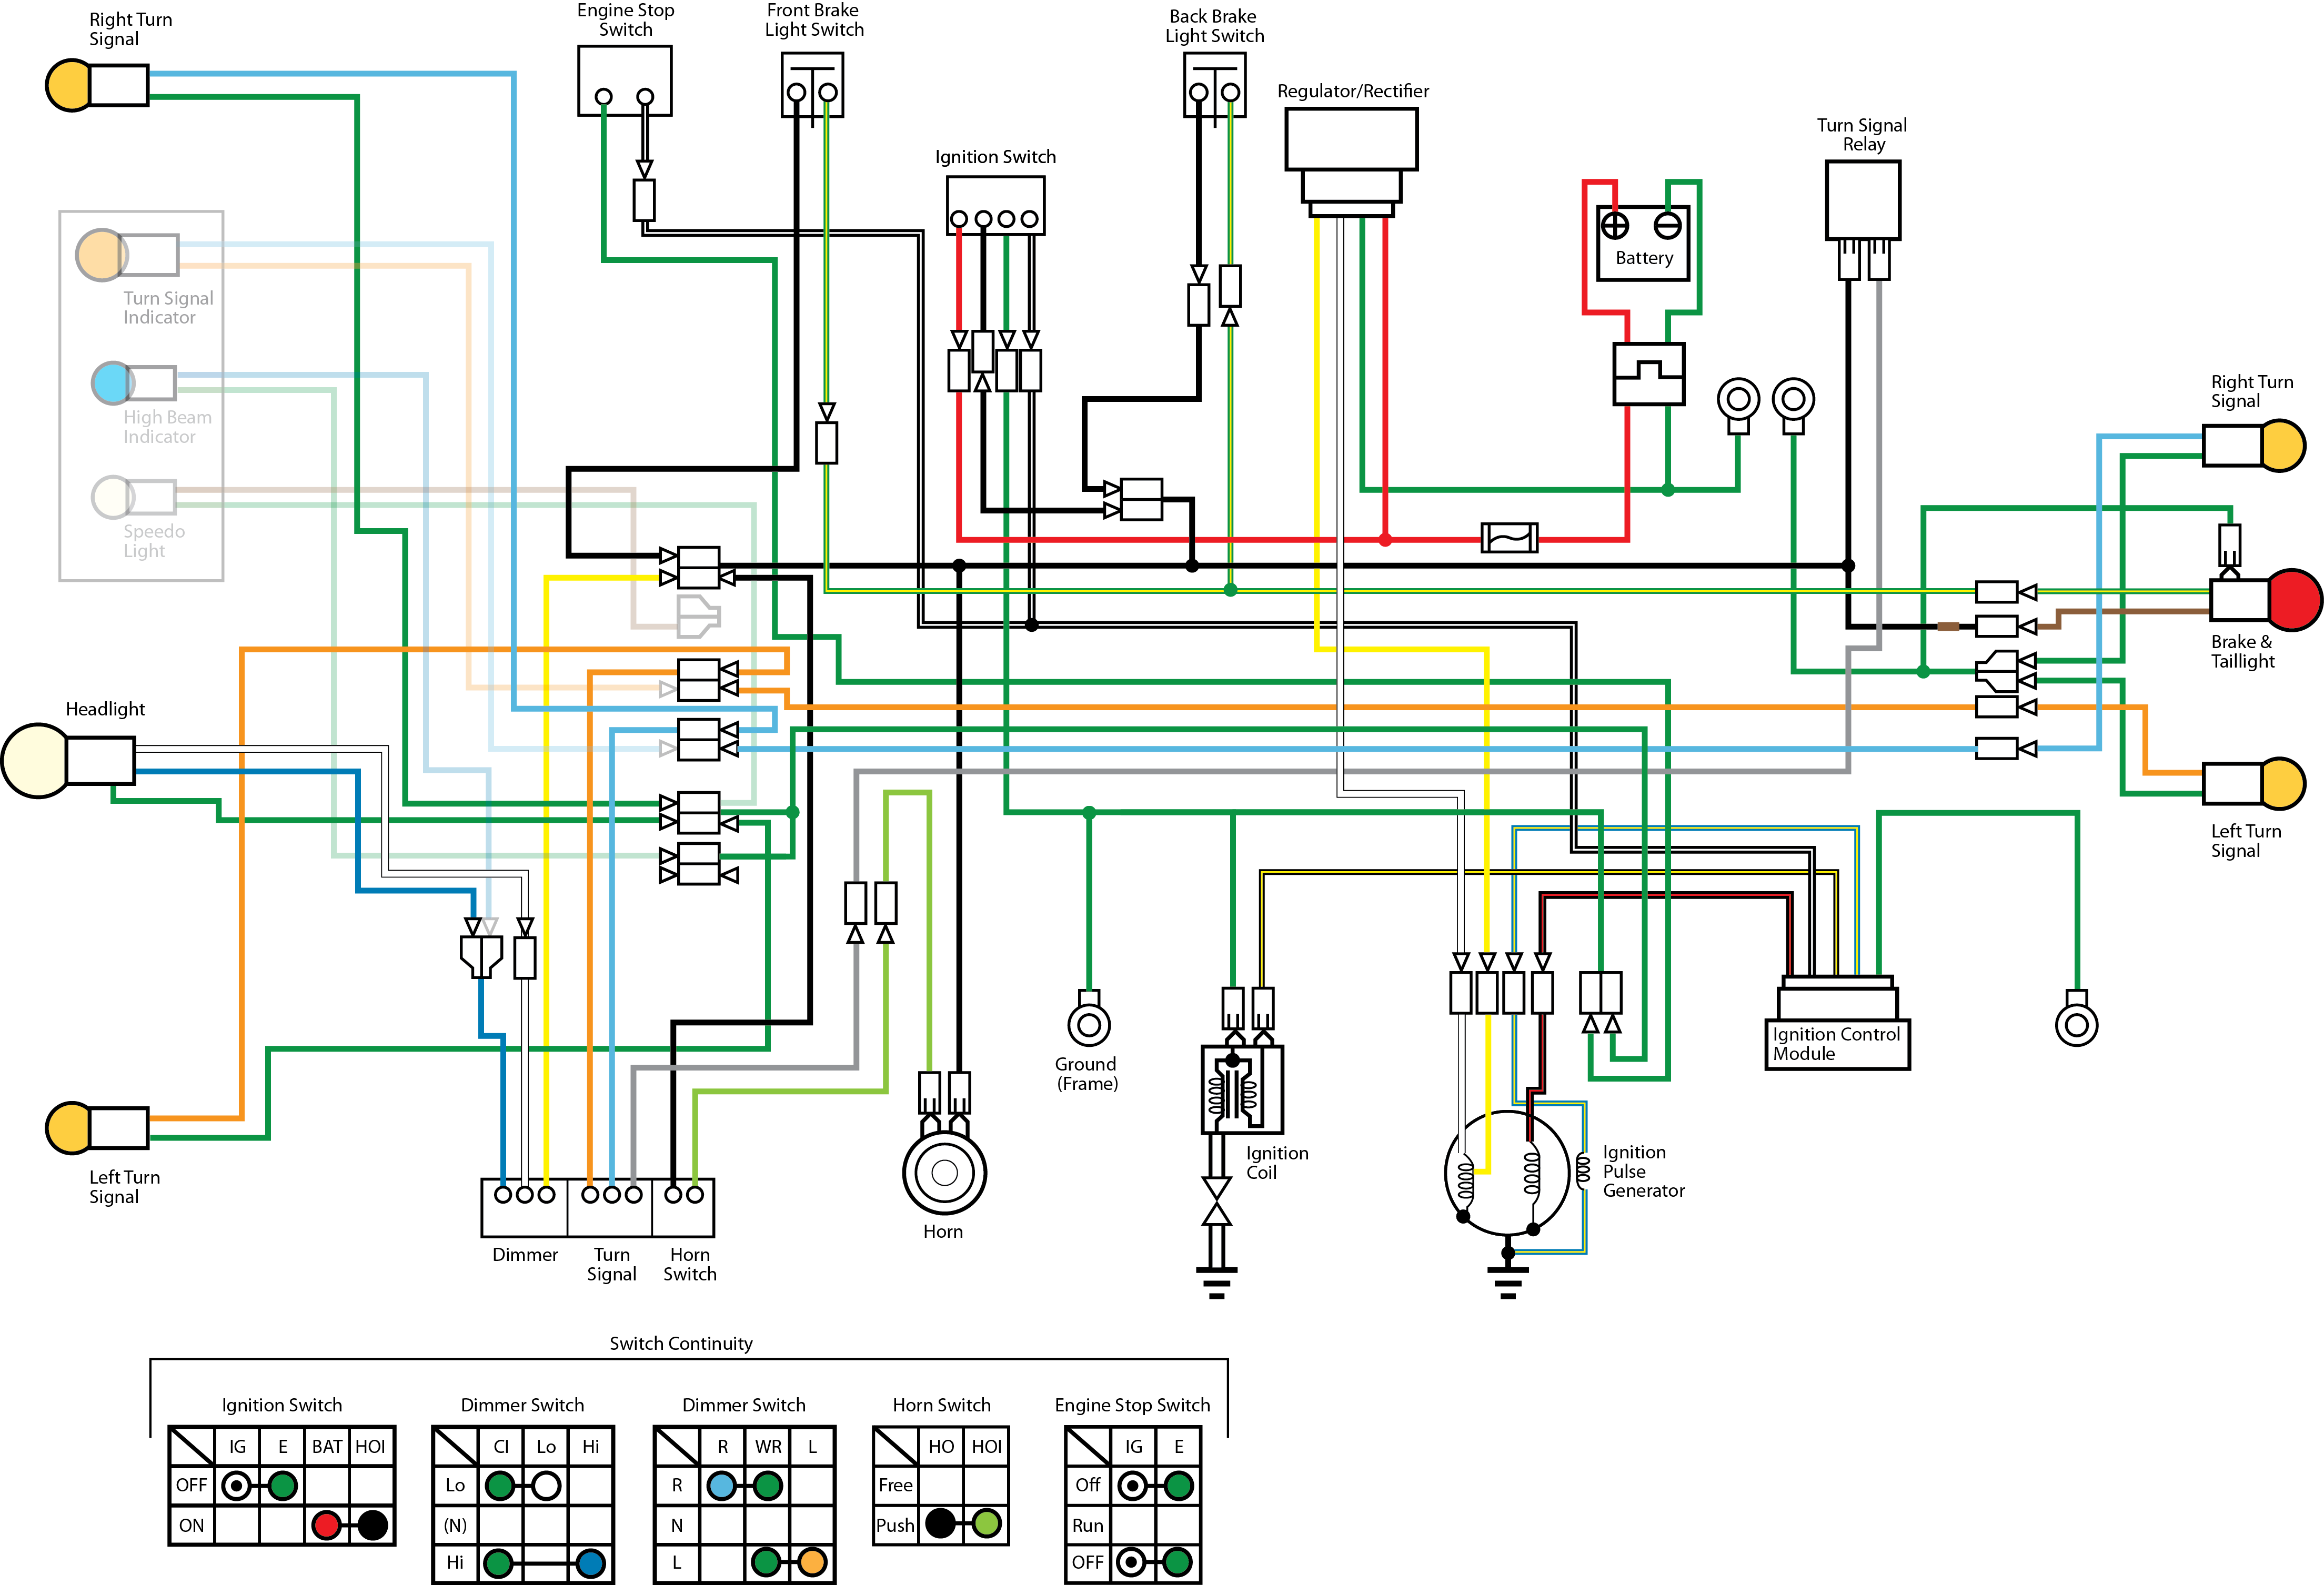 Honda Xrm Wiring Diagram Daily Update Cg 125 Pdf Schematic Motorcycle Circuit 110